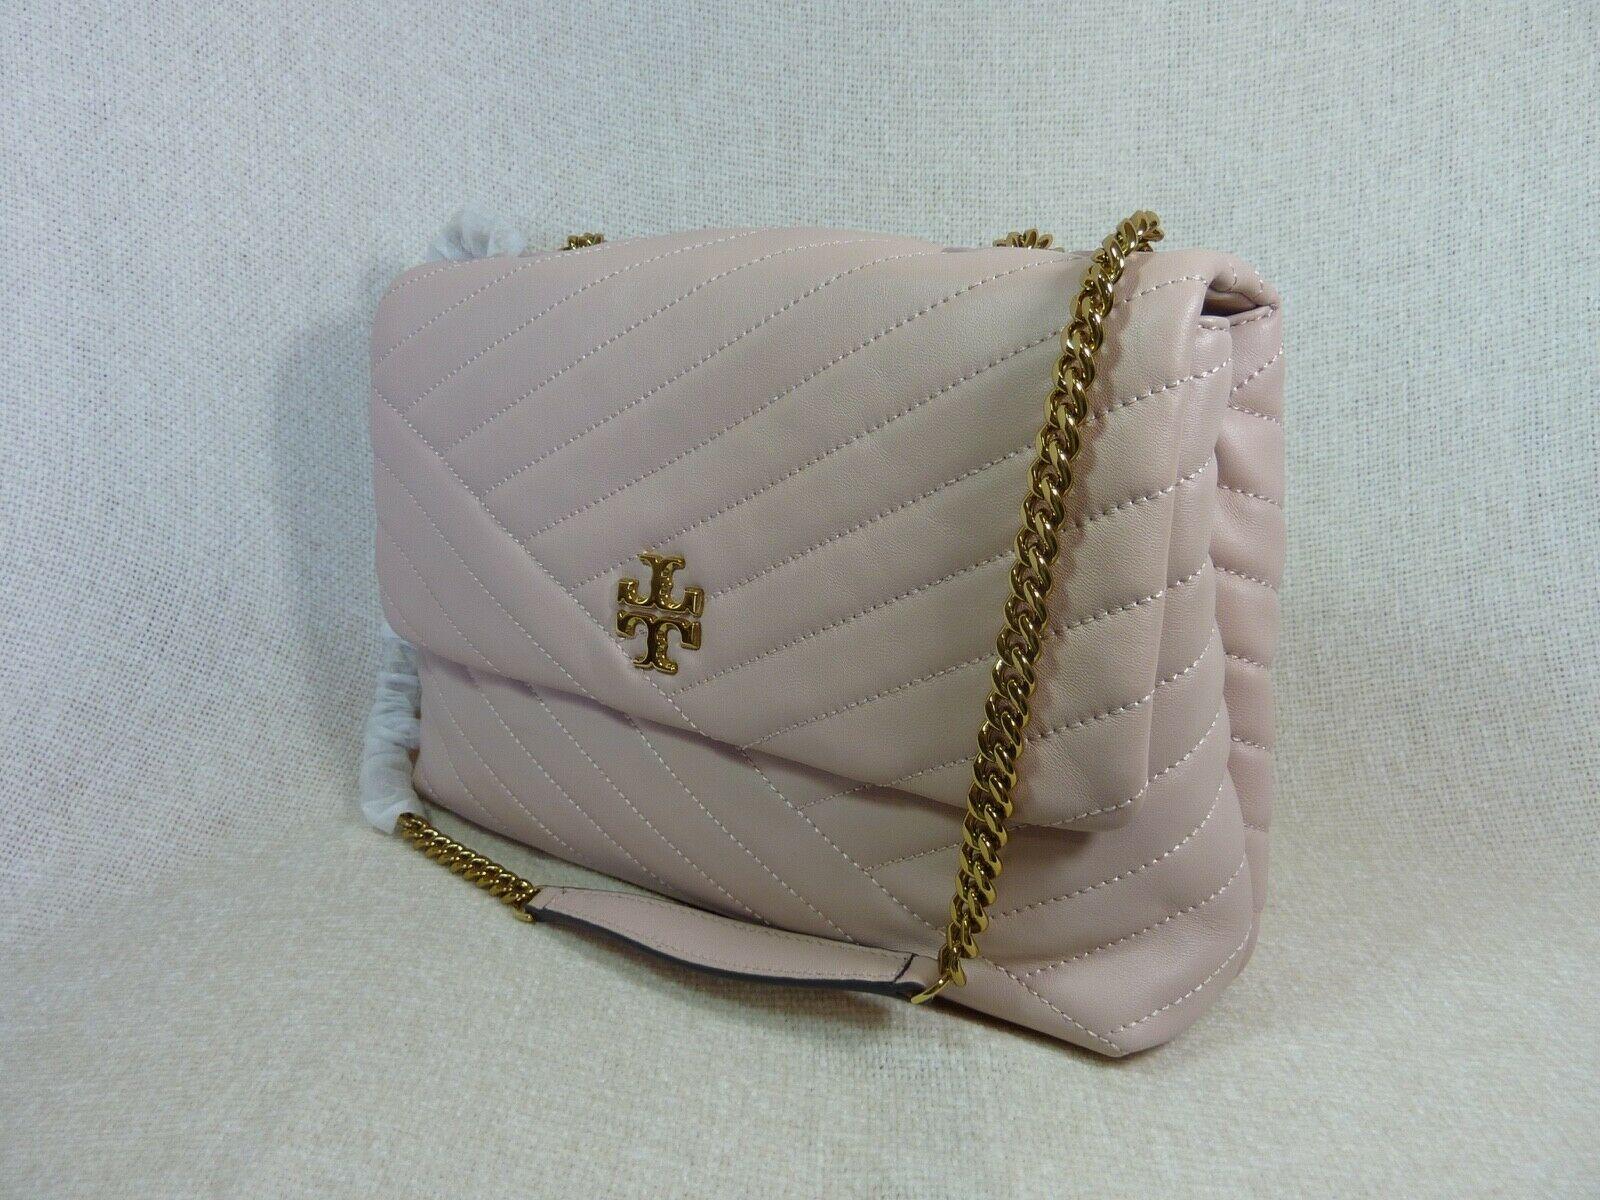 NWT Tory Burch Pink Moon Kira Chevron Convertible Shoulder Bag $528 image 5